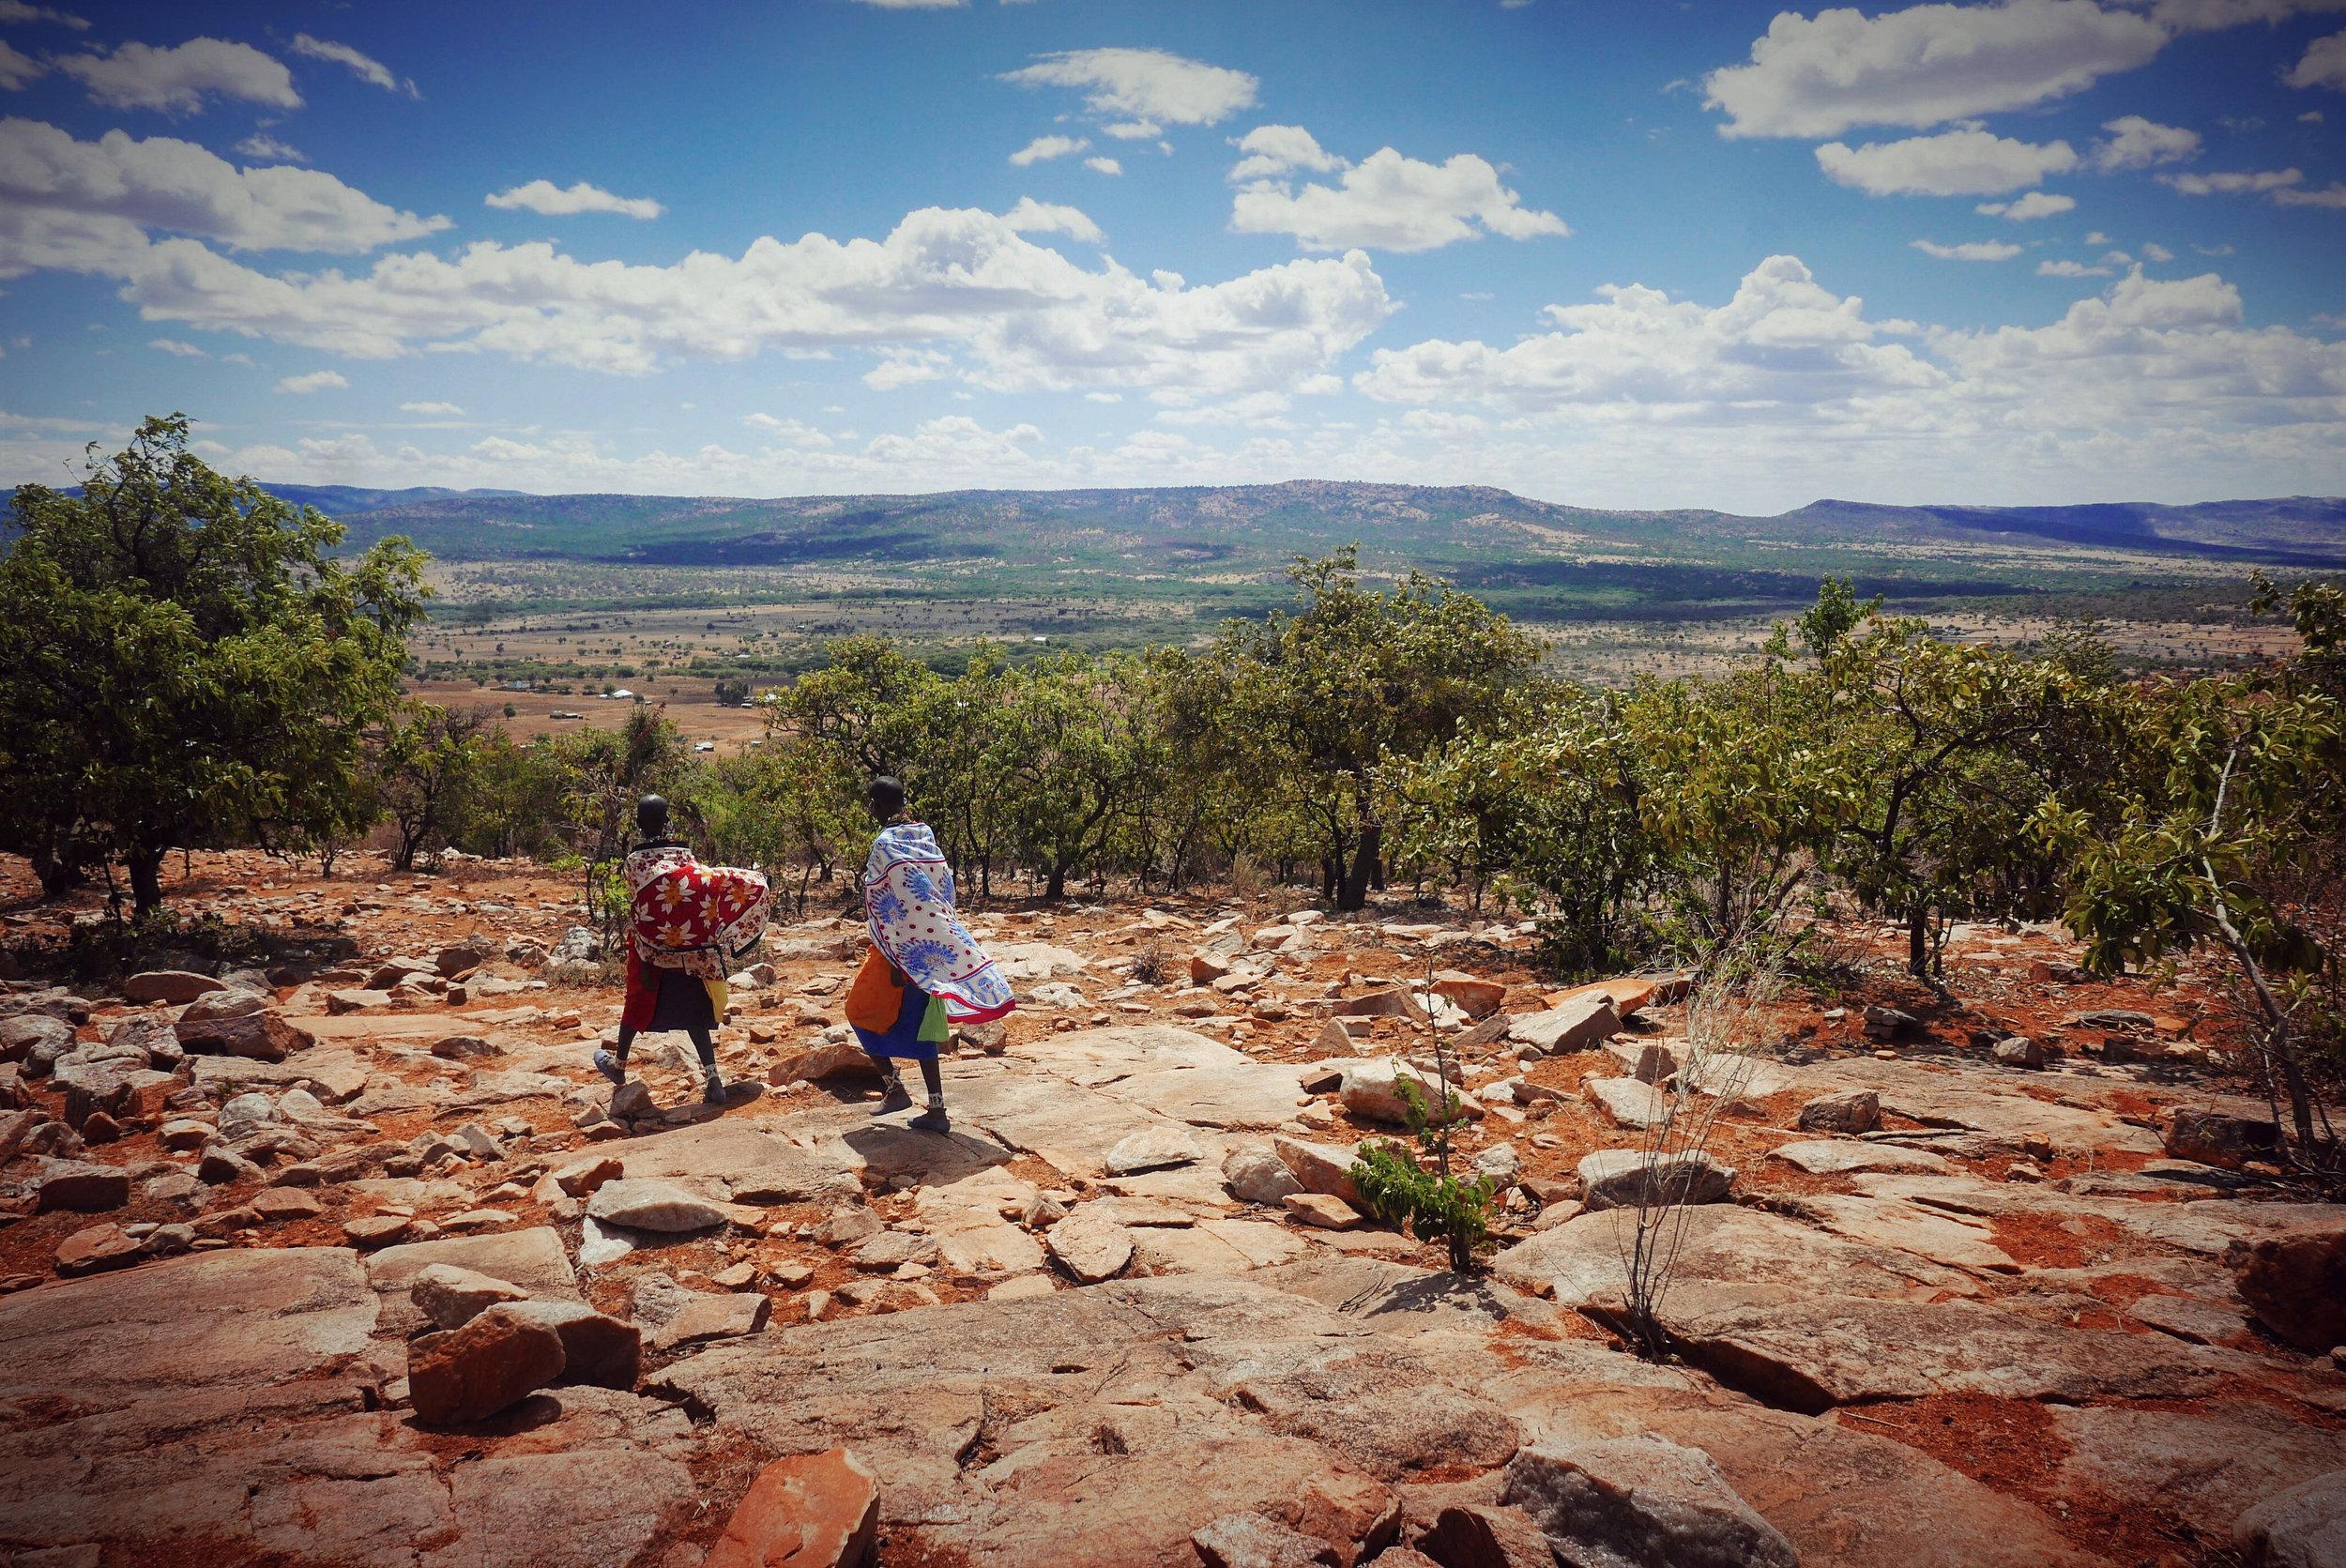 Maasai Honey women, Nalari and Nasarisarau, on their way to work from their distant home in Sero sub-village.